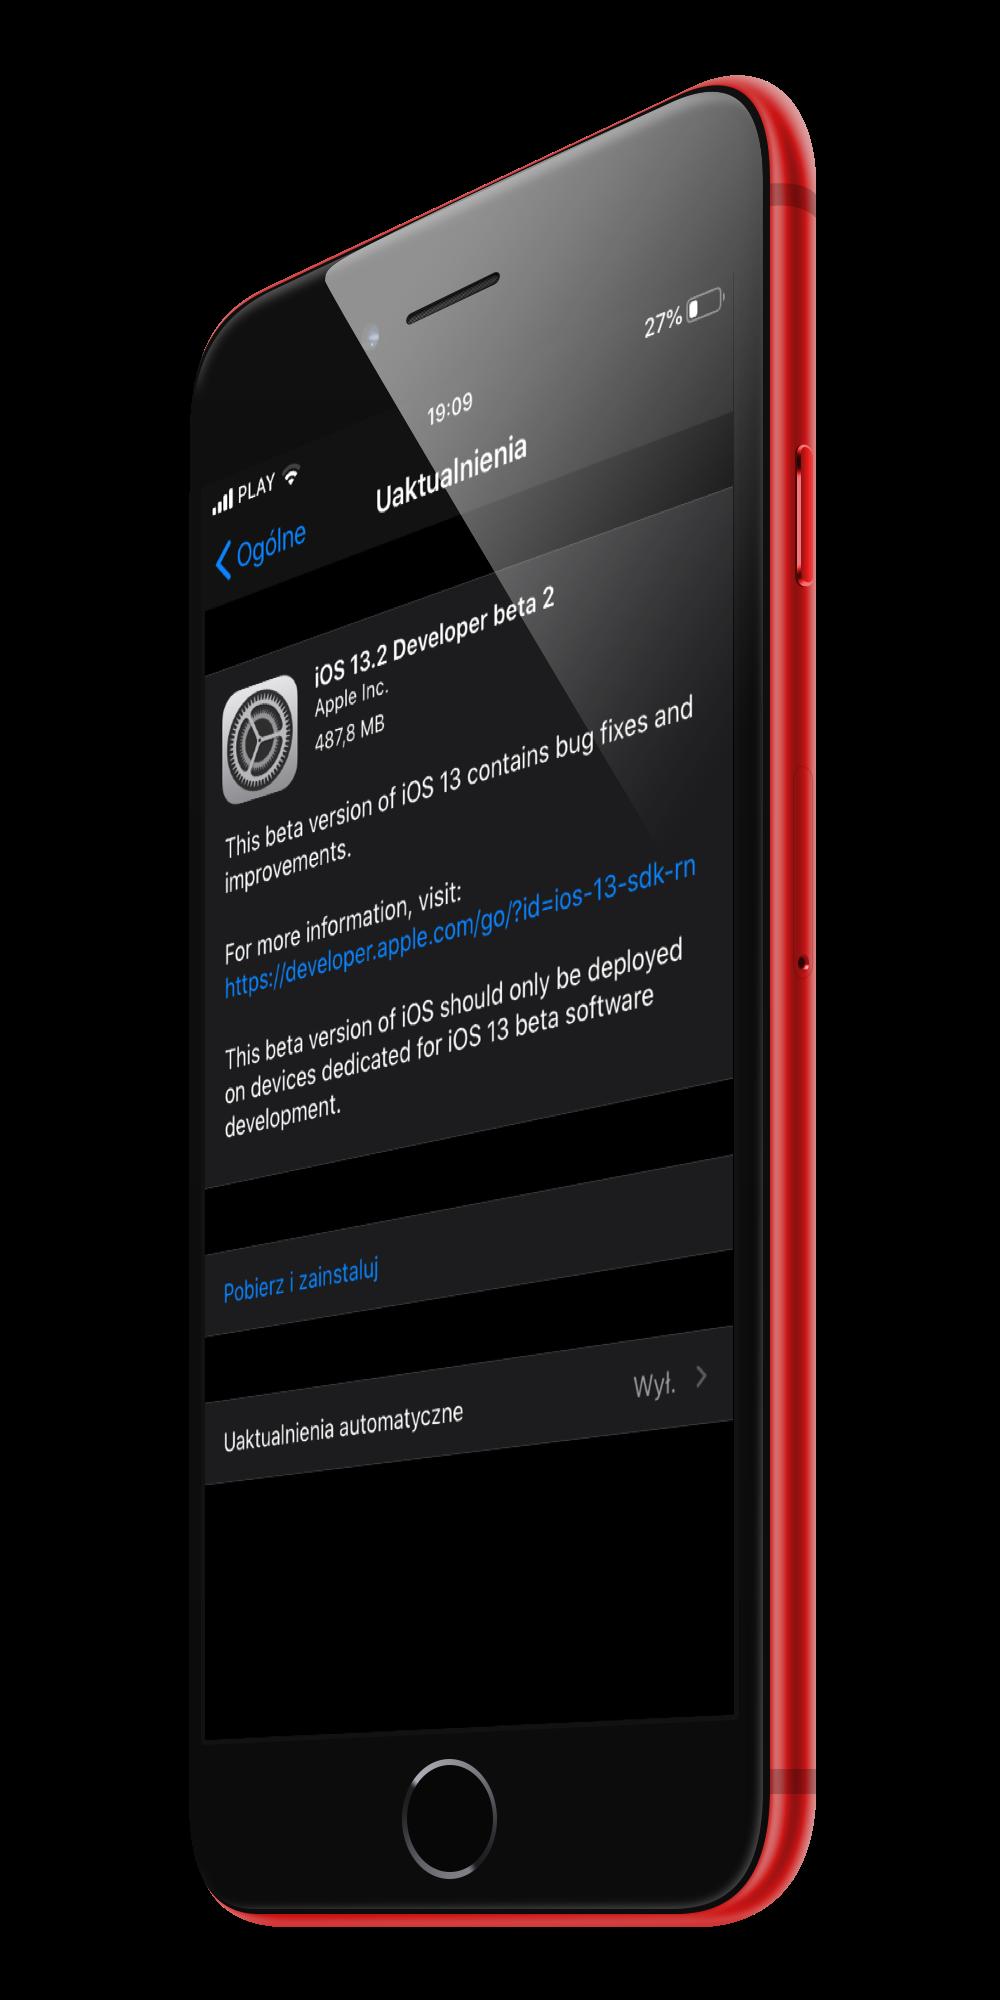 iOS 13.2 beta 2 co nowego kiedy nowe emoji Apple iPhone 11 Deep Fusion